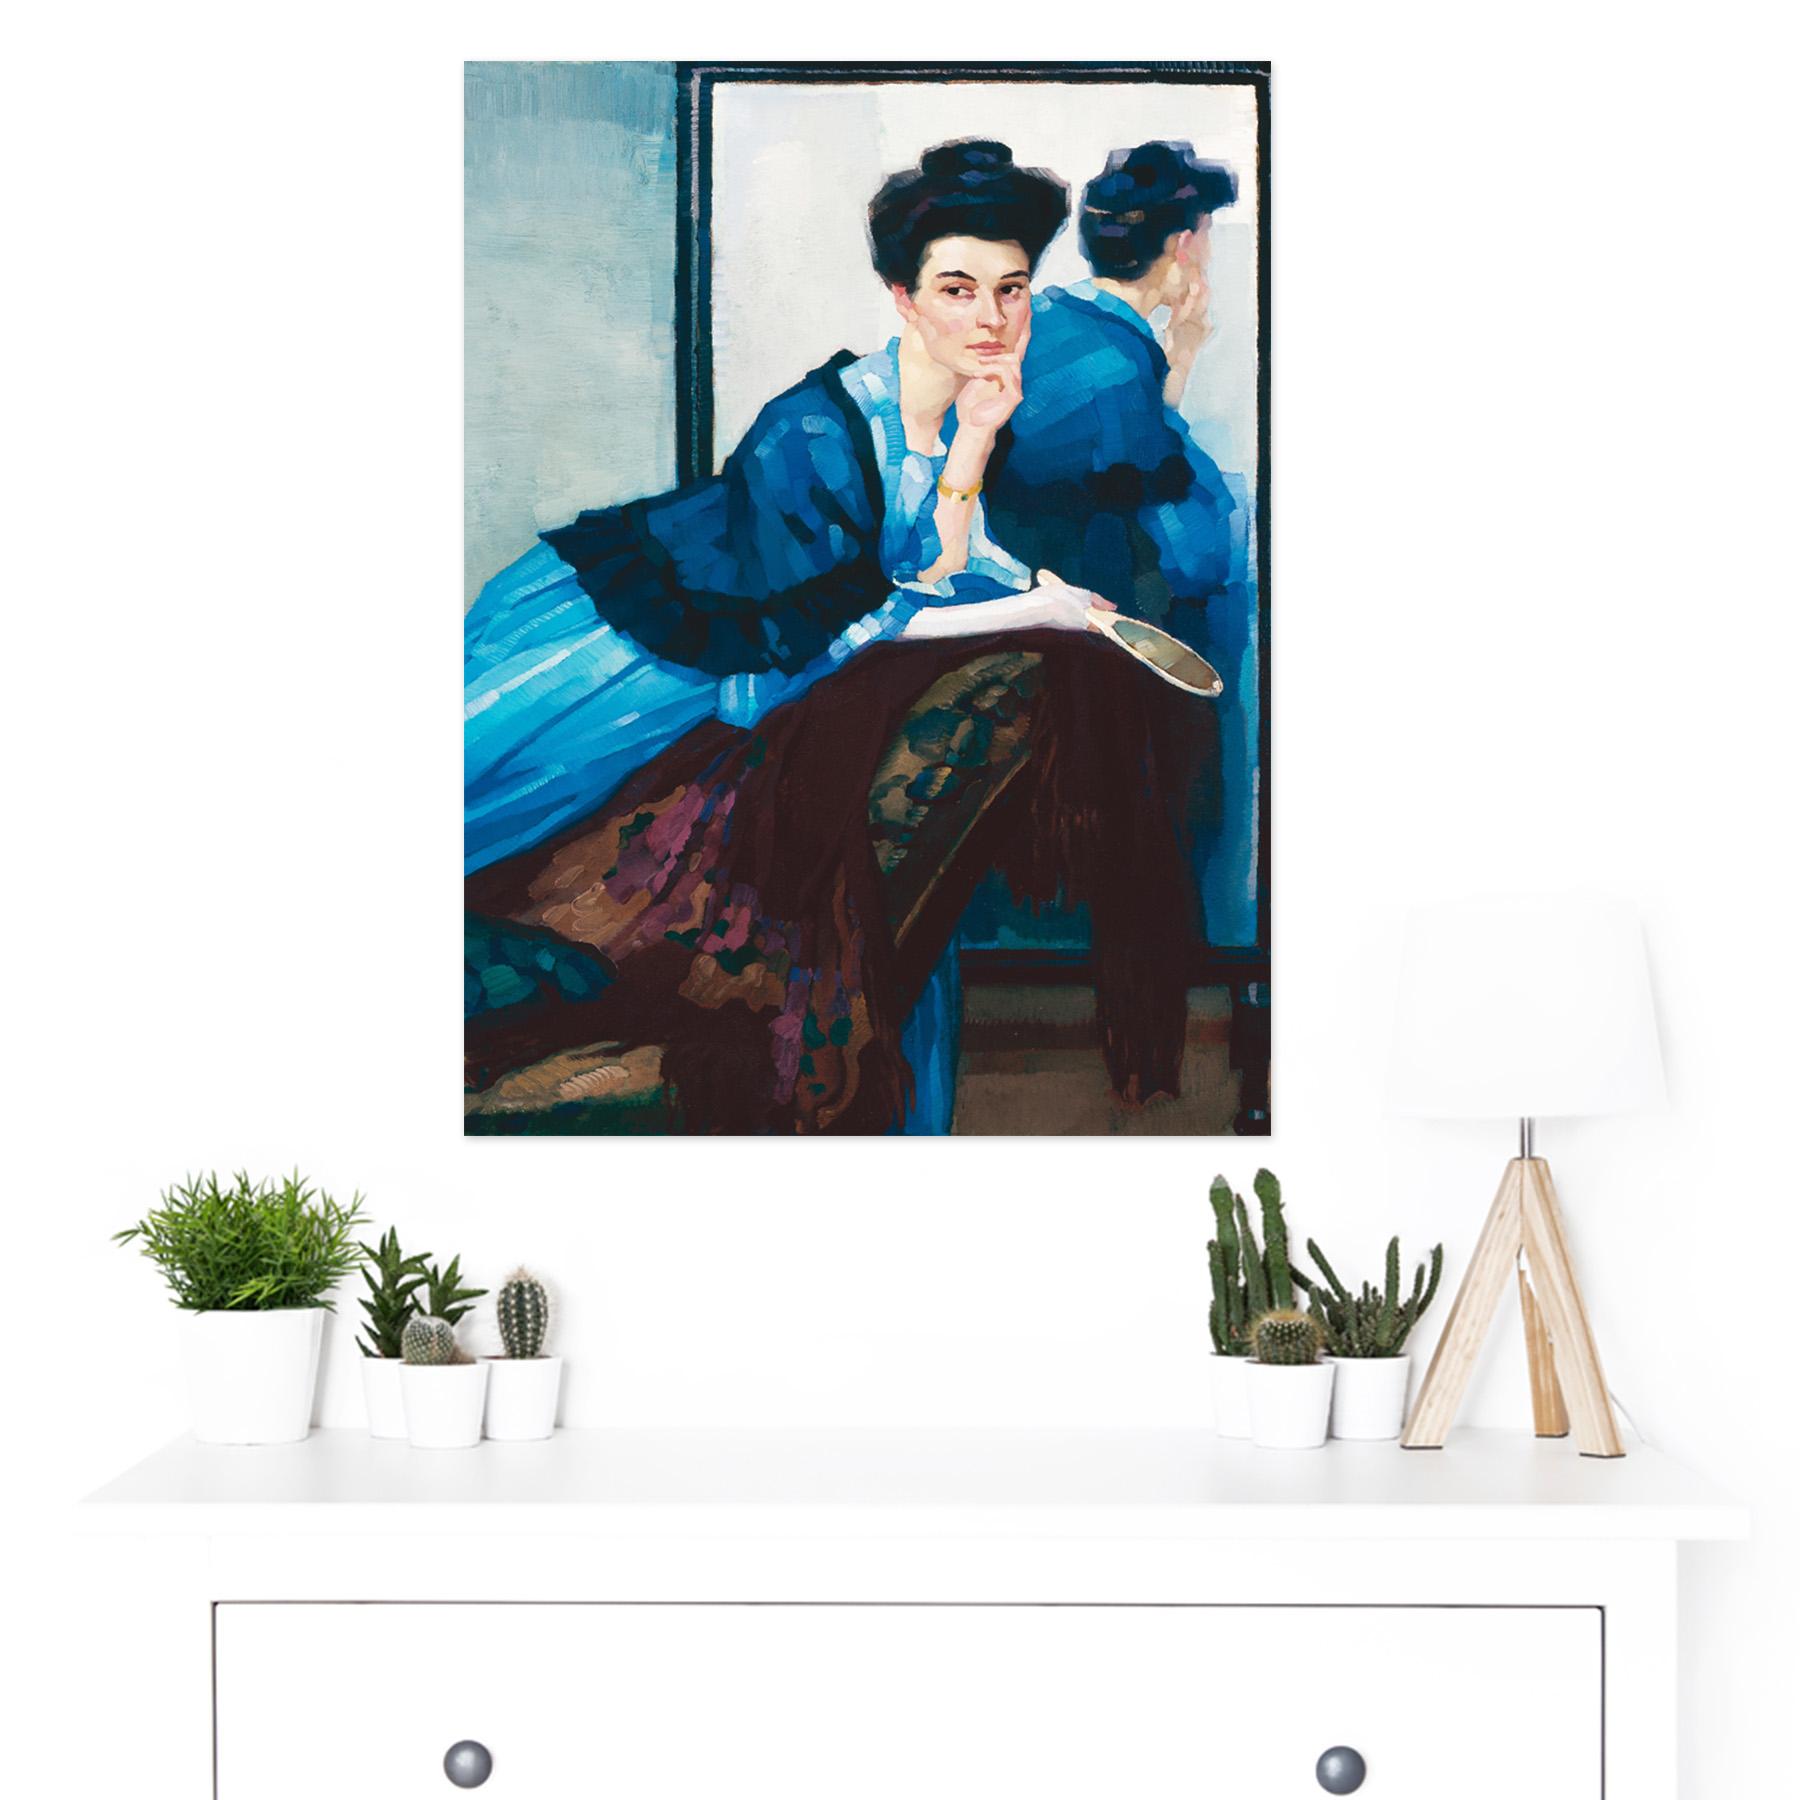 Putz-Woman-In-Blue-Dress-Painting-Large-Framed-Art-Print thumbnail 3